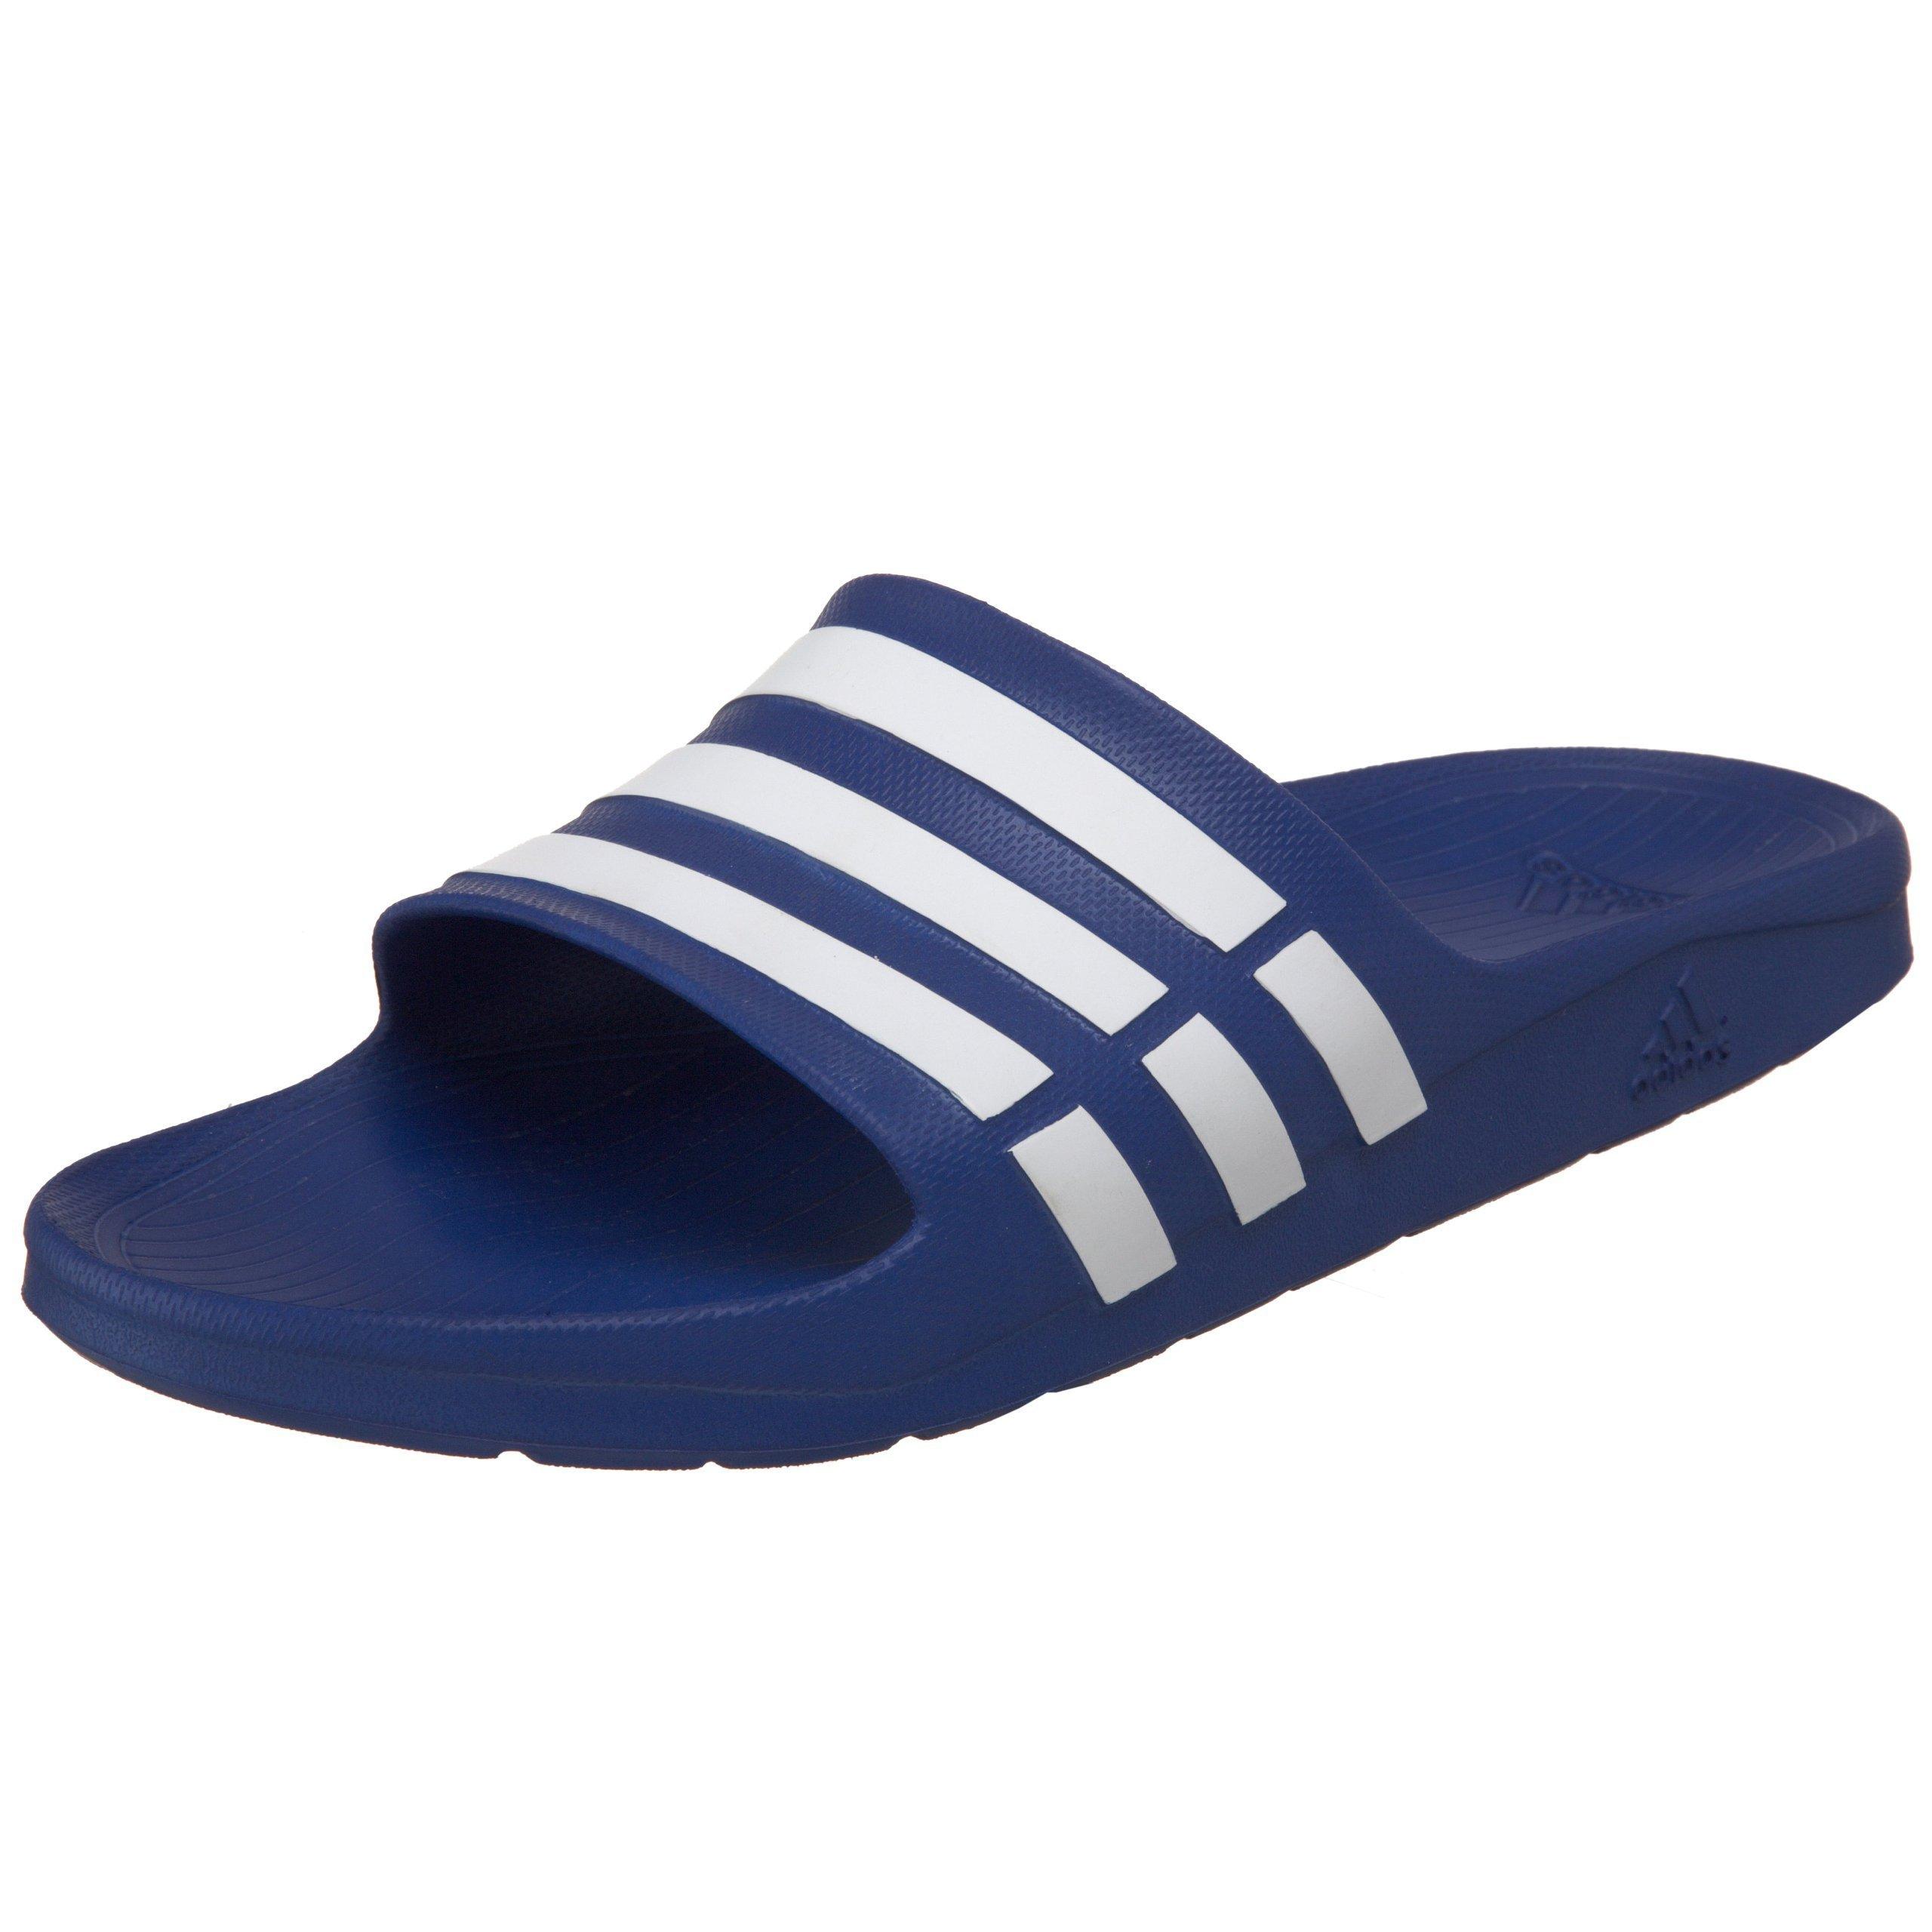 23c7bd5d1fe87 Get Quotations · adidas Duramo Slide Sandal